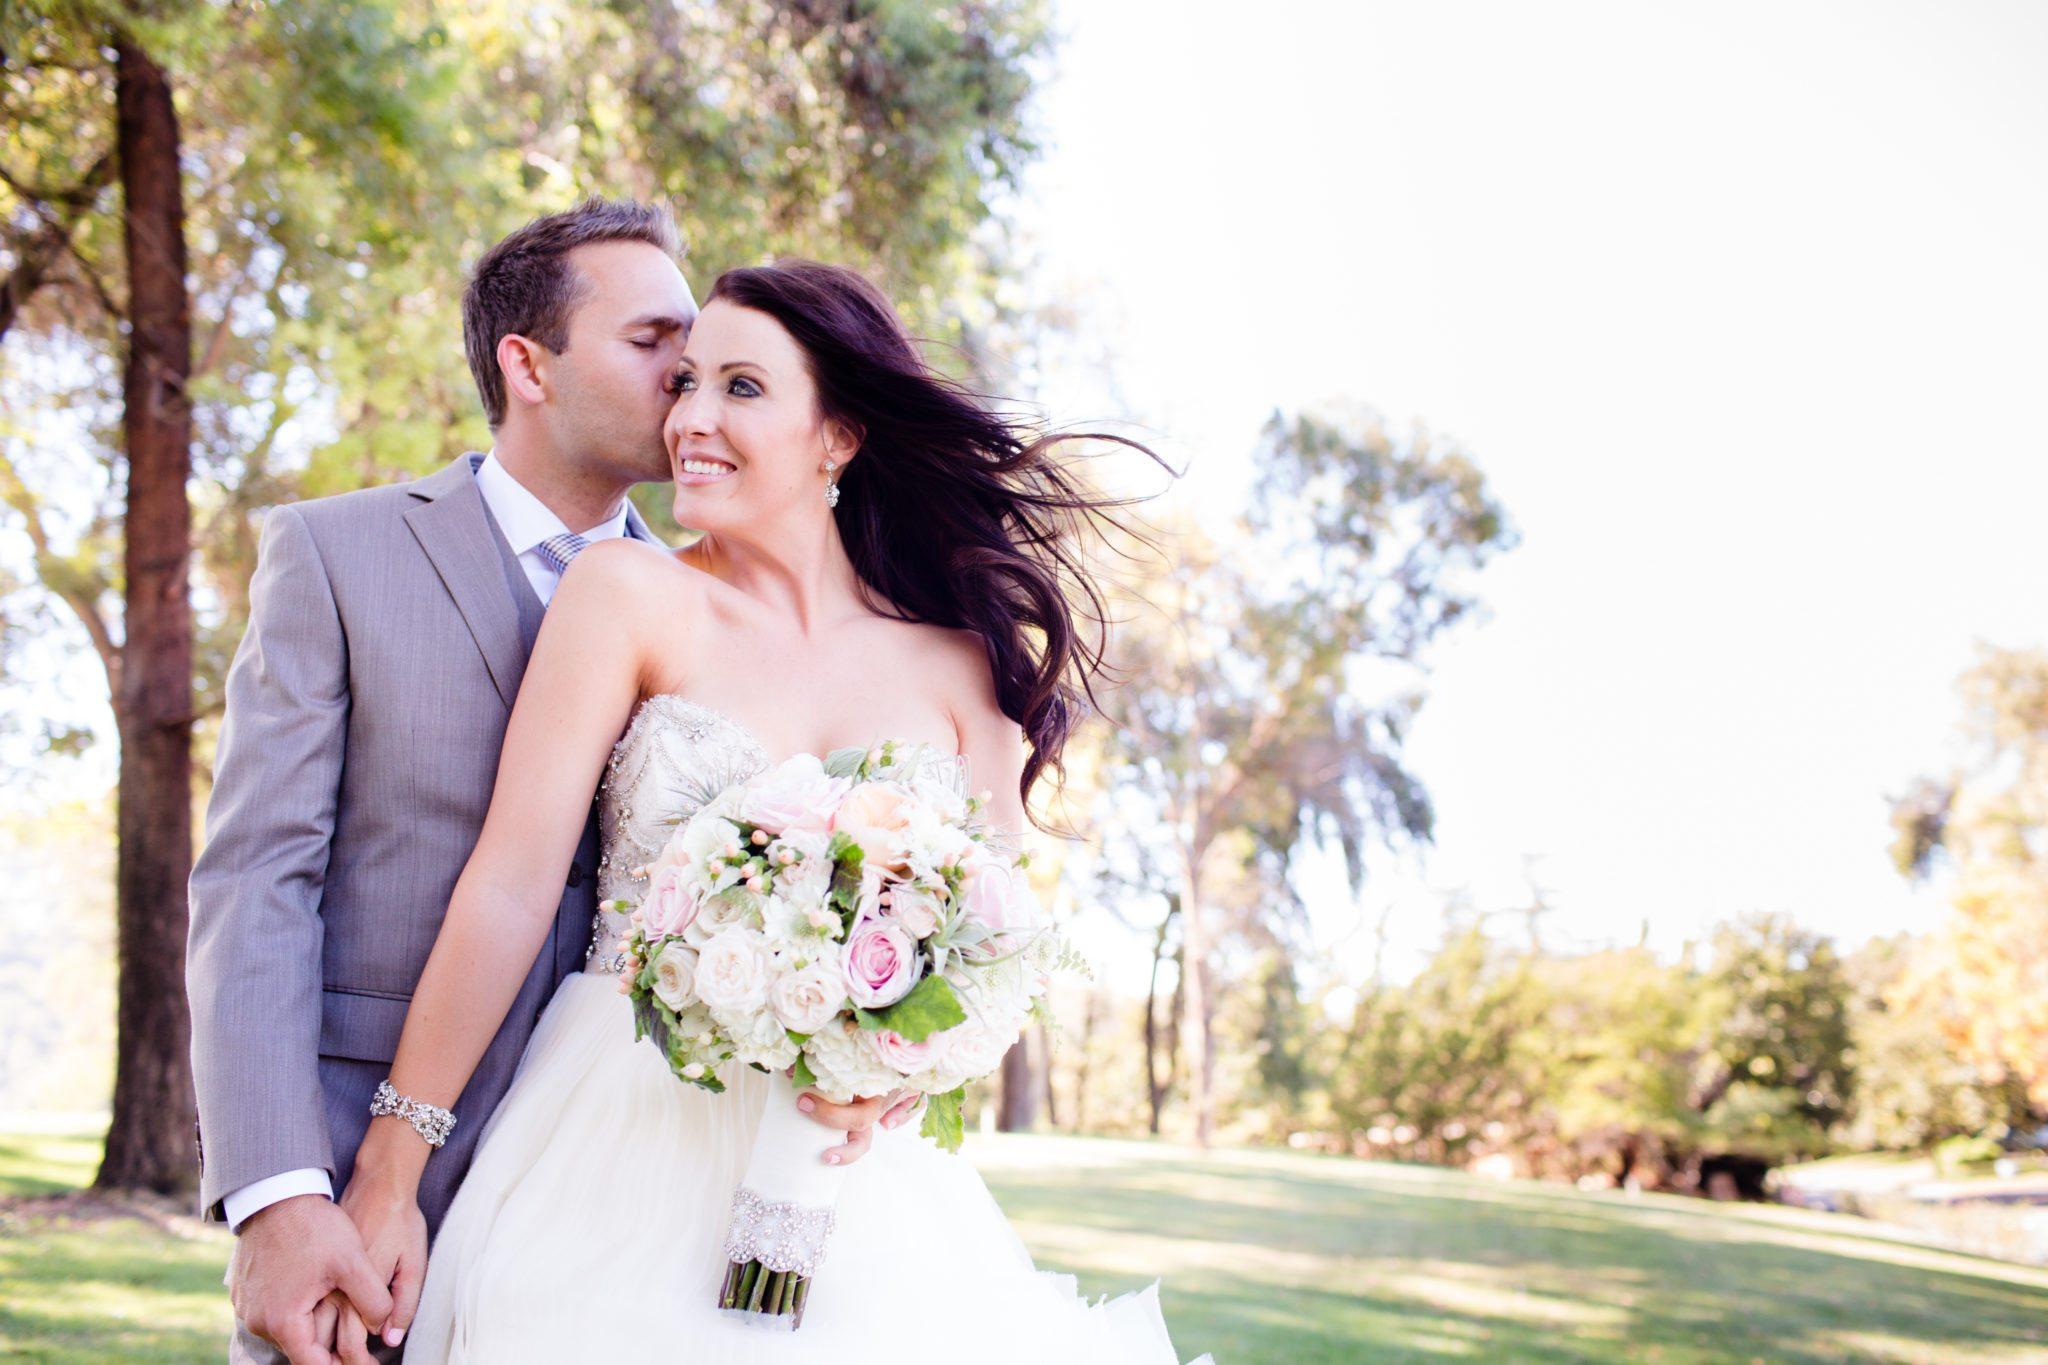 Temecula_Creek_Inn_Wedding_044.jpg